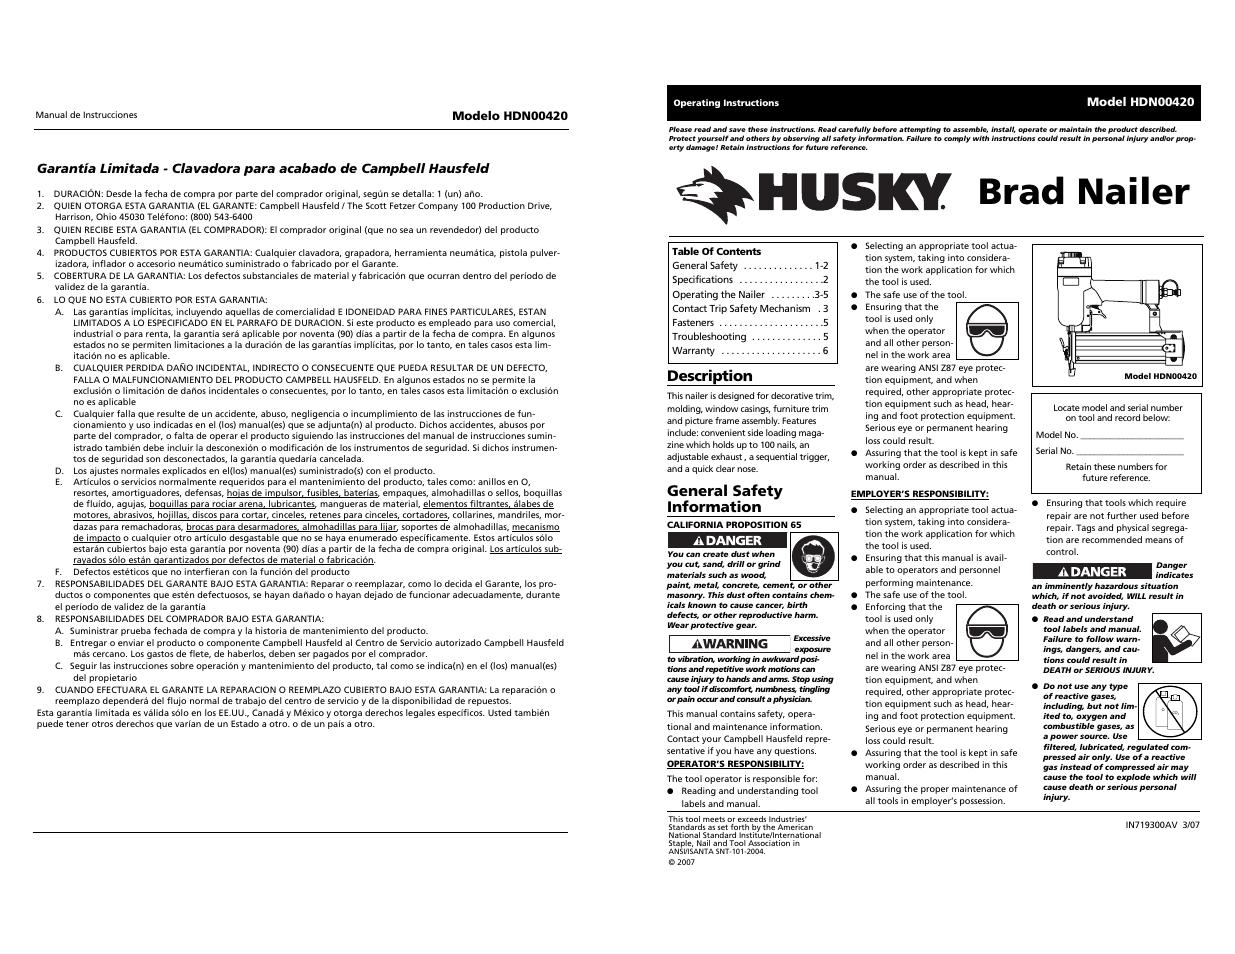 husky hdn00420 user manual 10 pages original mode rh manualsdir com huskee user manual model hu500n22sh clearpath husky user manual